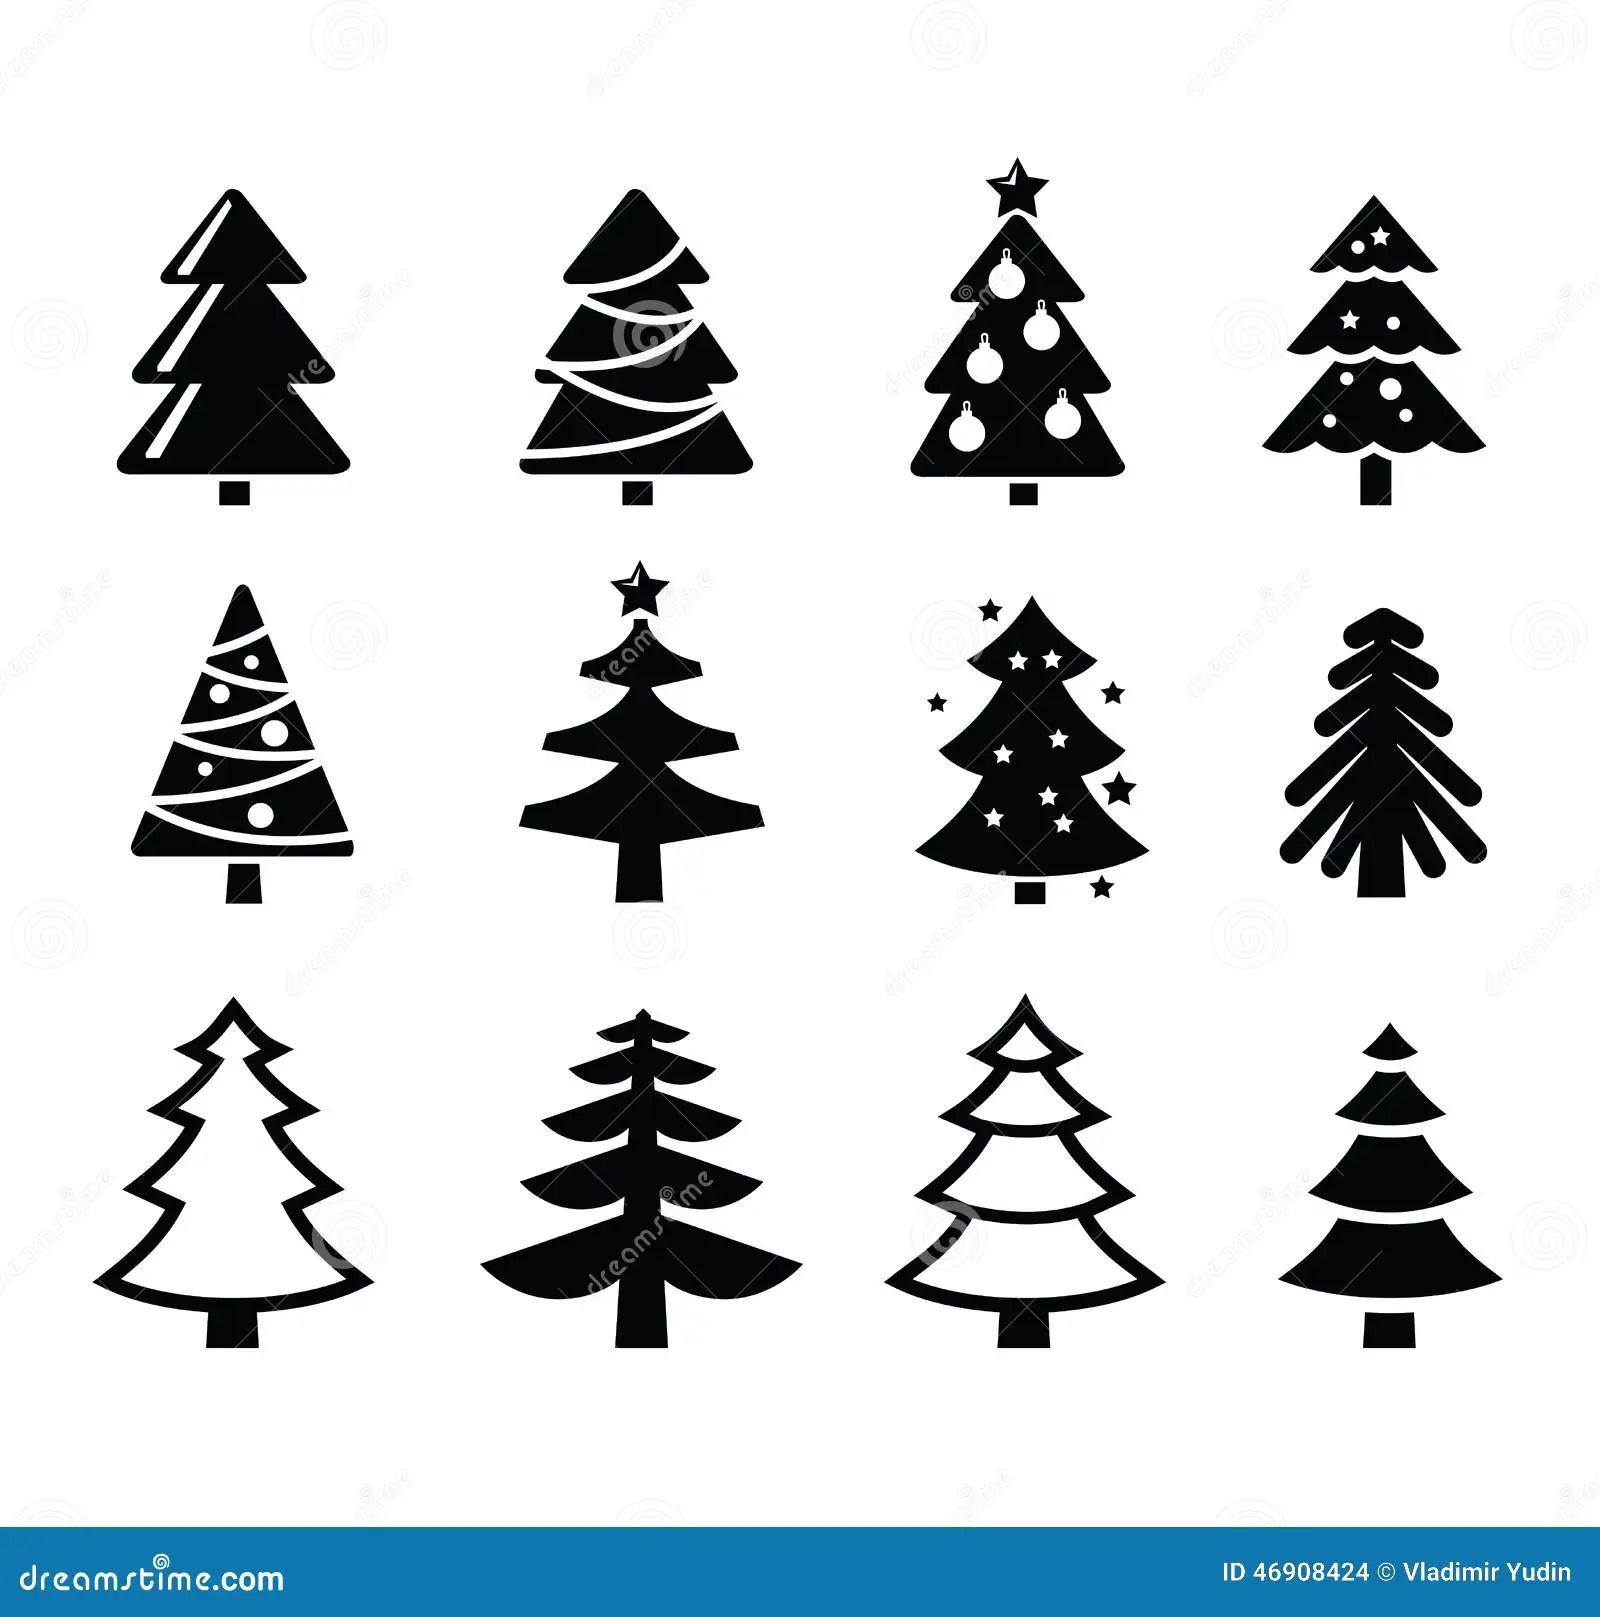 Christmas Tree Stock Vector Illustration Of Pictogram